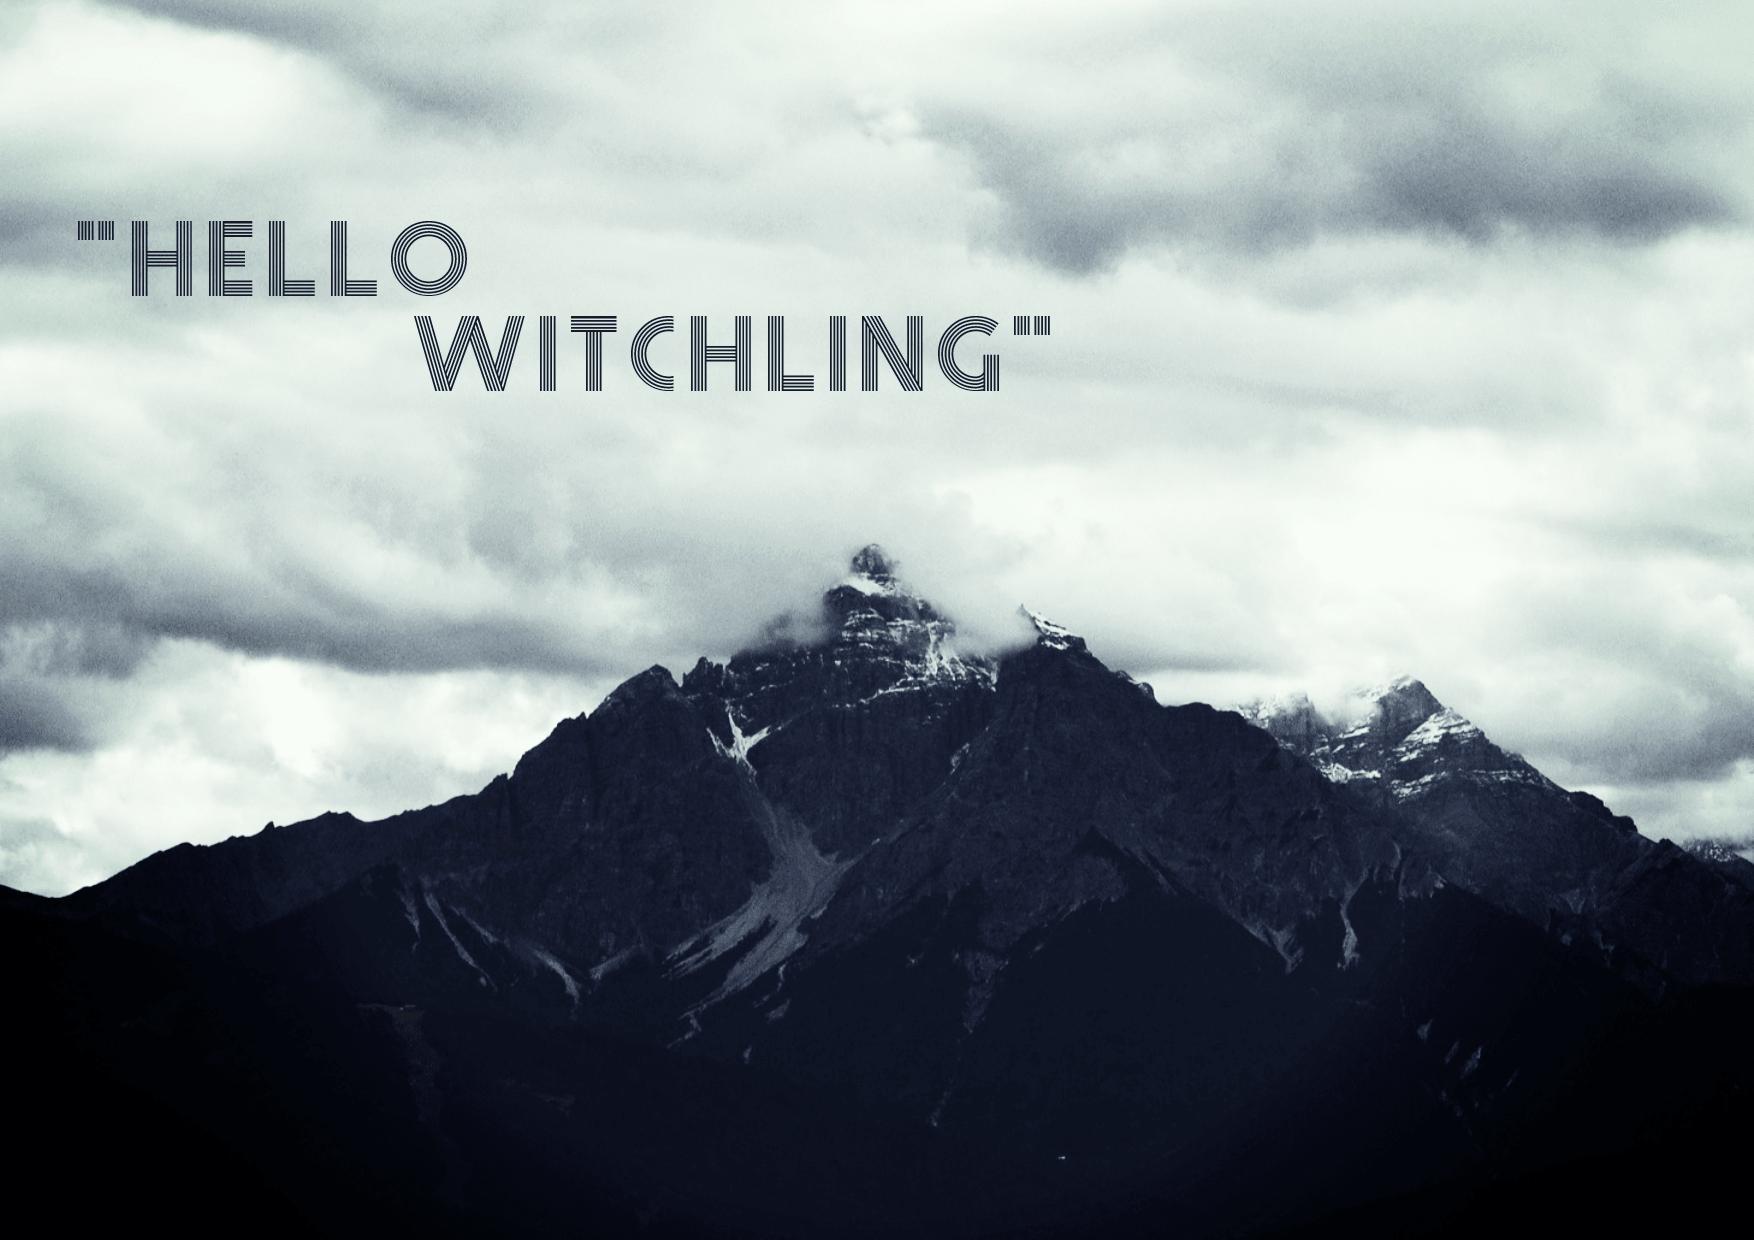 Sky,                Mountainous,                Landforms,                Cloud,                Ridge,                Mountain,                Range,                Hill,                Station,                Geological,                Phenomenon,                Mount,                Scenery,                 Free Image